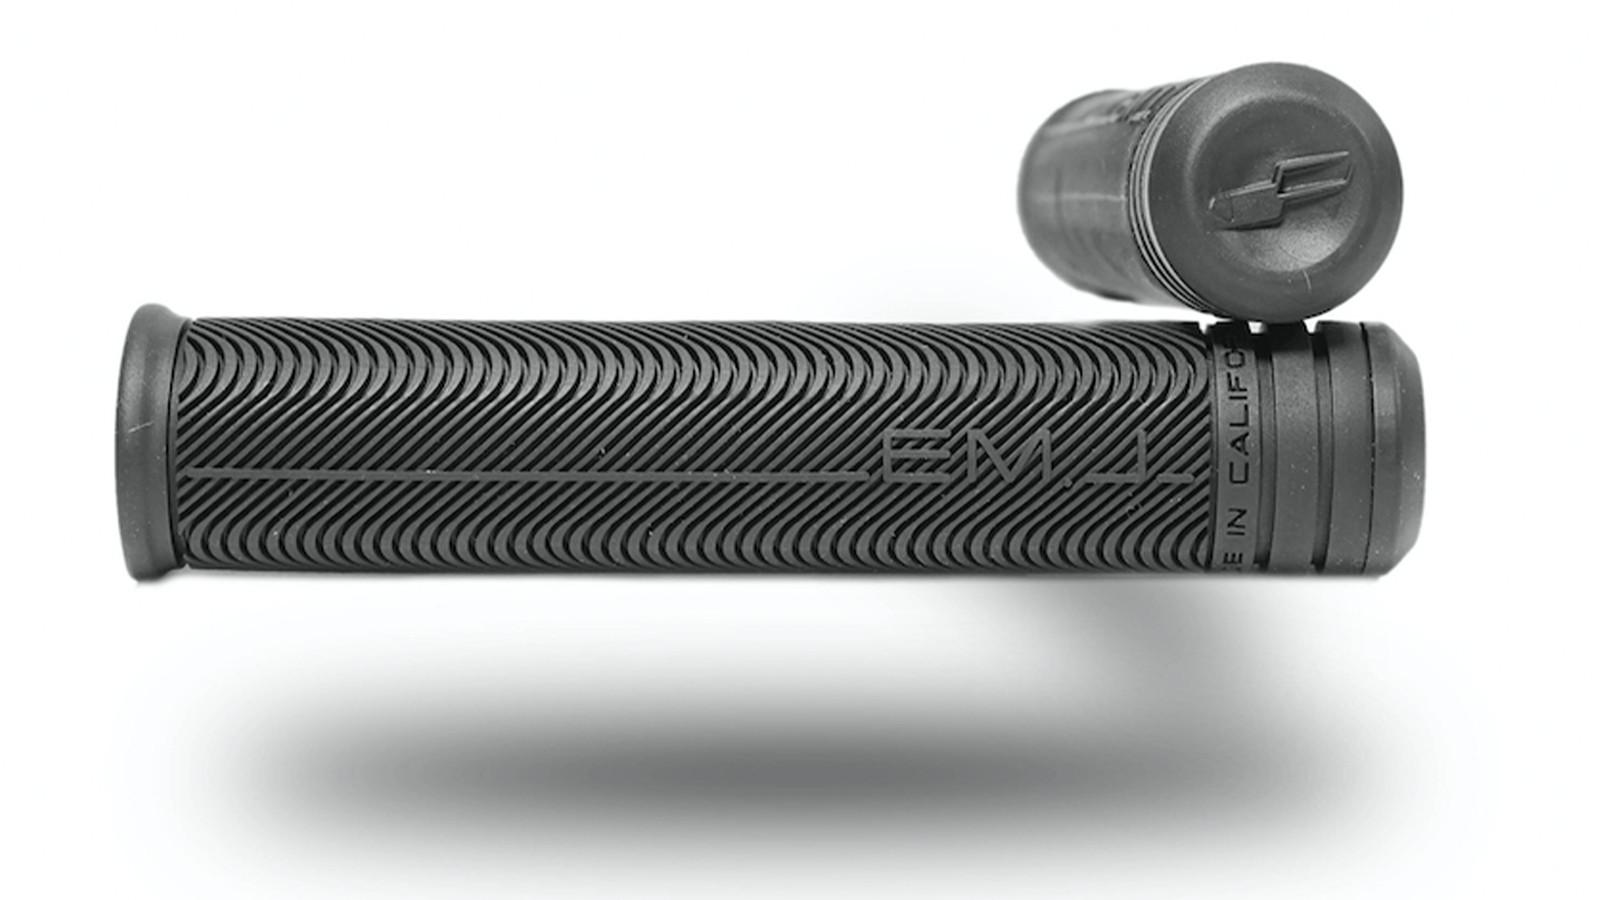 Sensus Launches the Emil Johansson Signature Grip - The Em J